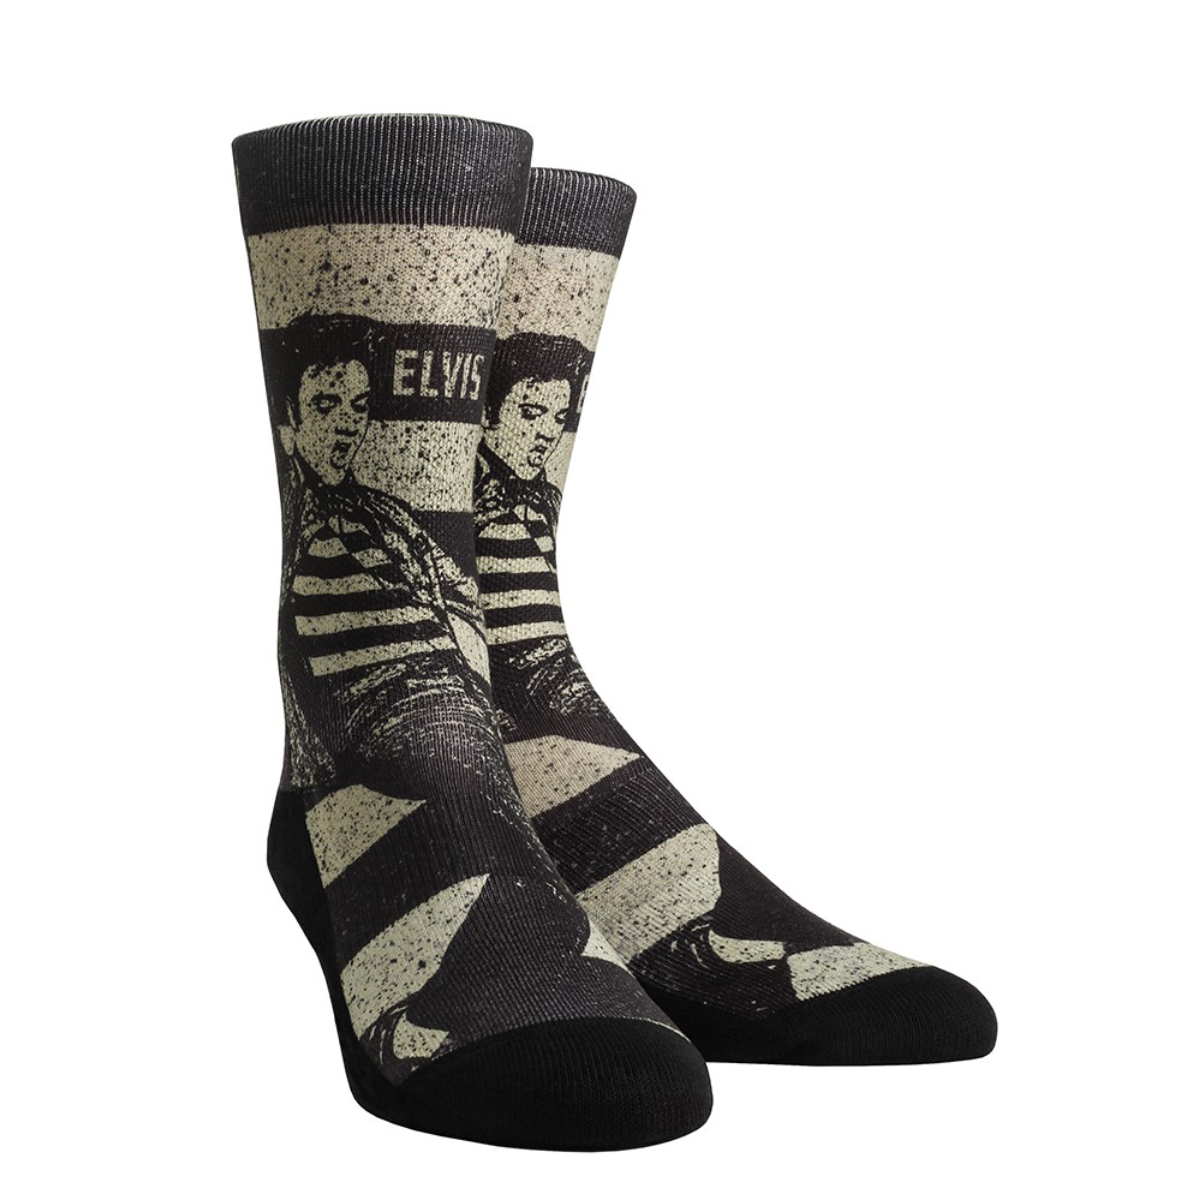 Elvis Presley Jailhouse Rock Socks Adult Shop The